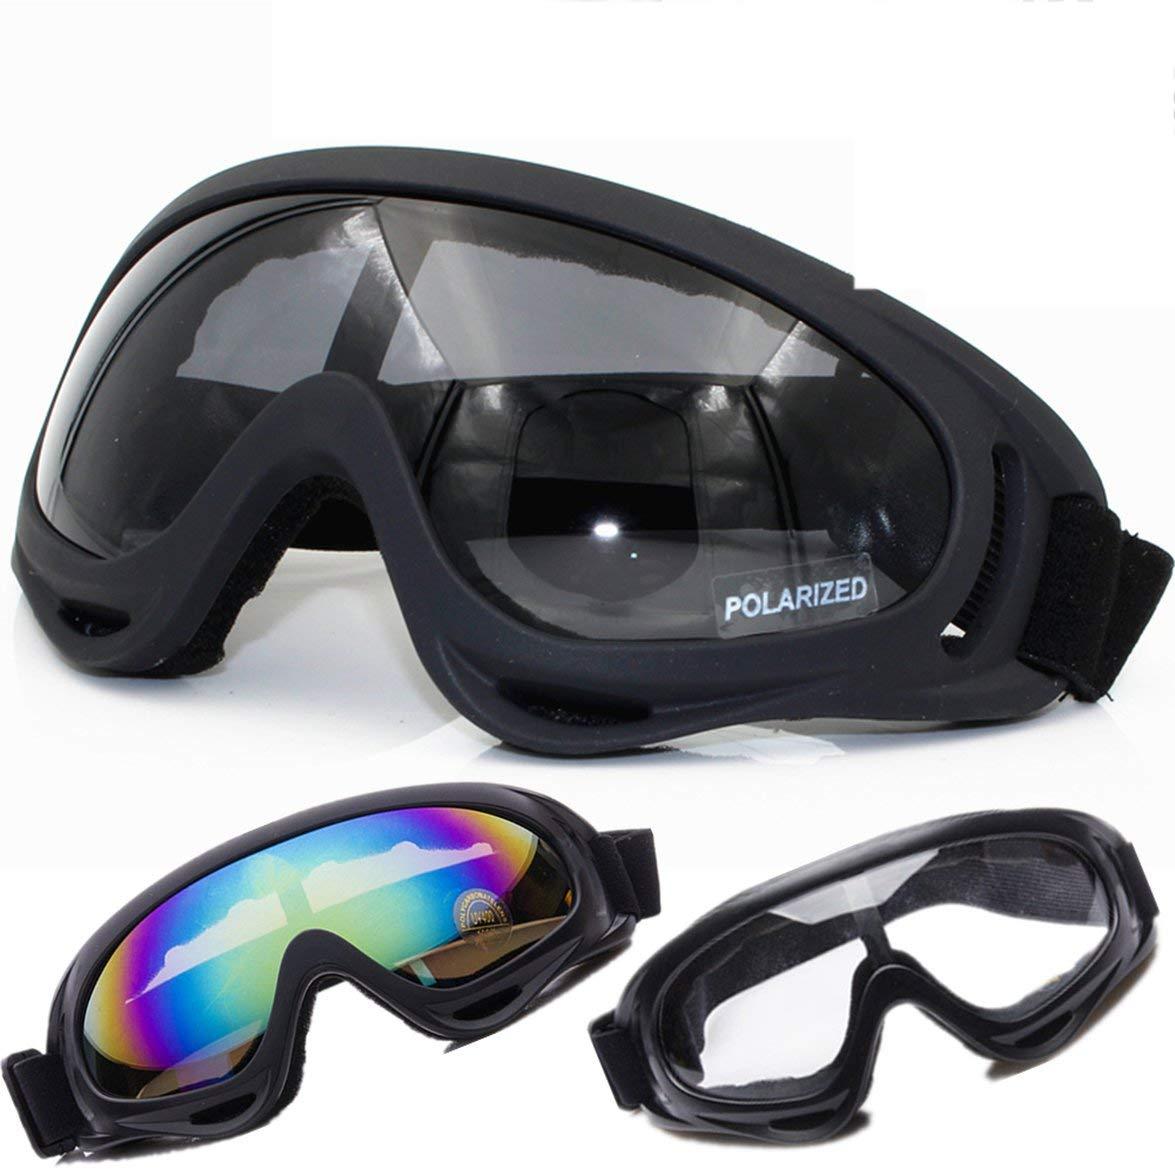 Pandamama Portable Cycling Sun Glasses Bike Sunglasses Outdoor Sports Bicycle Glasses SPOSUNE X400 Men Women Goggles